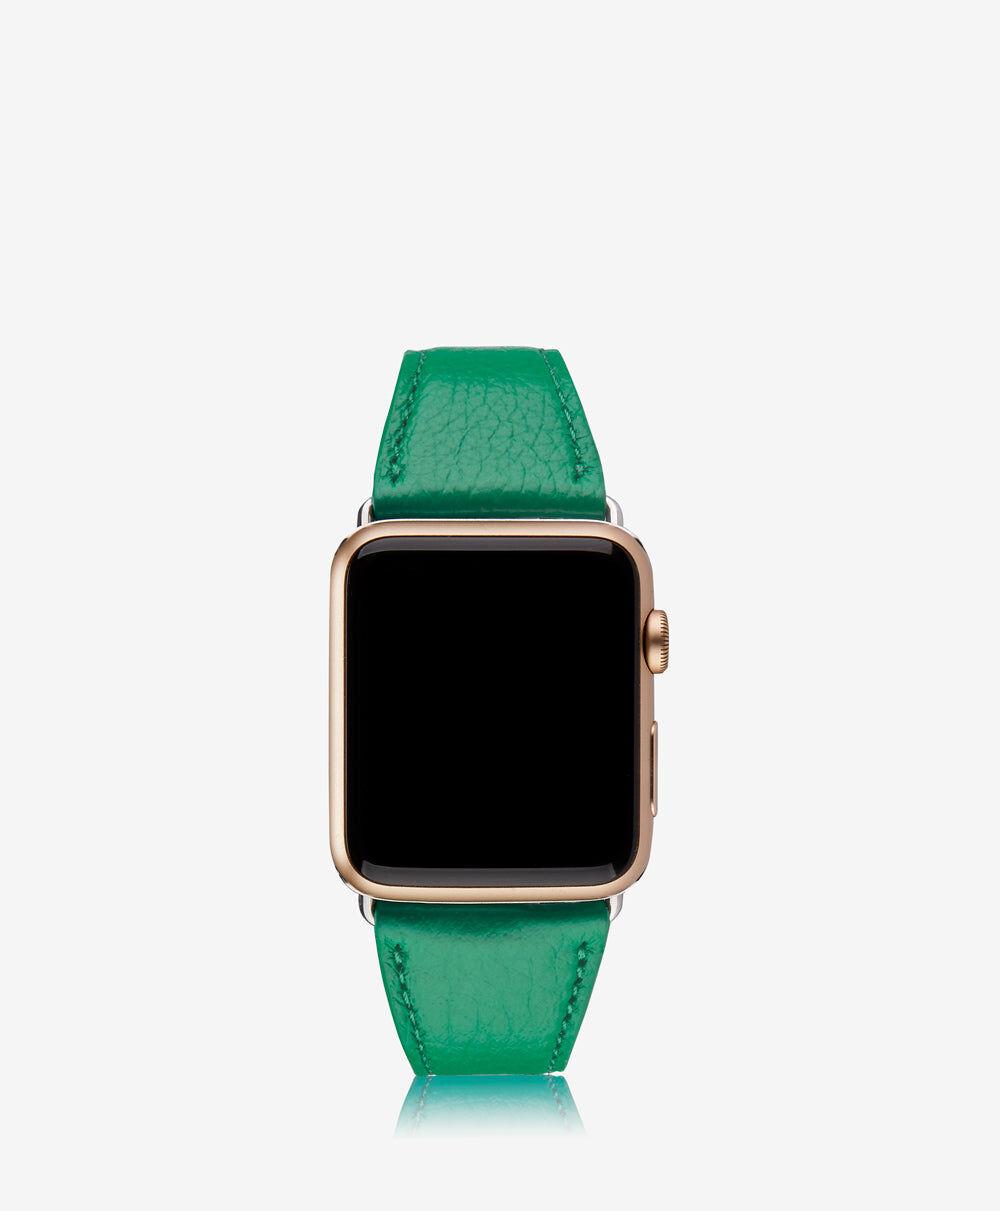 GiGi New York 42mm Apple Watch Band Jade Pebble Grain Leather